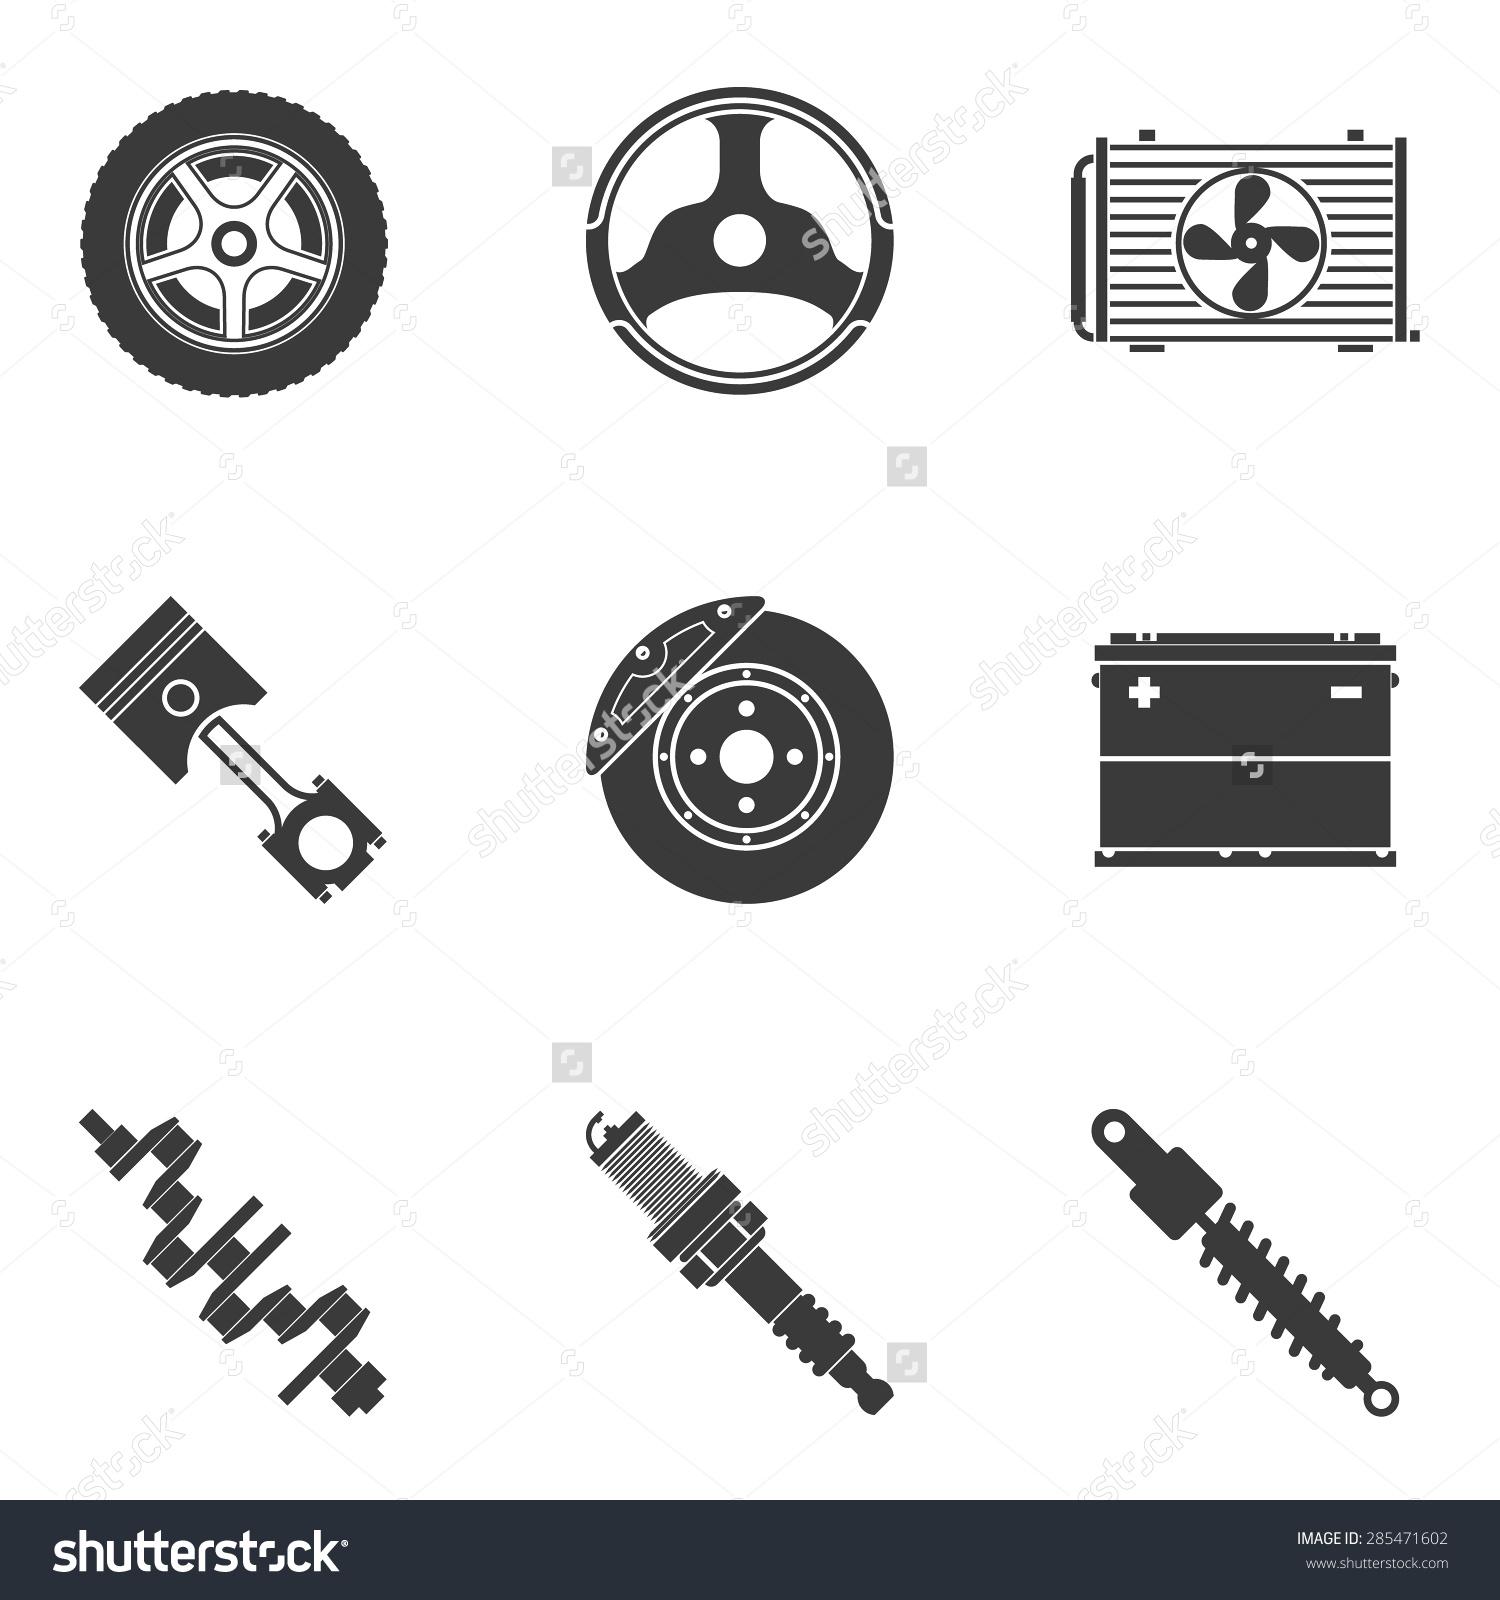 Spare Wheel Stock Vectors & Vector Clip Art.